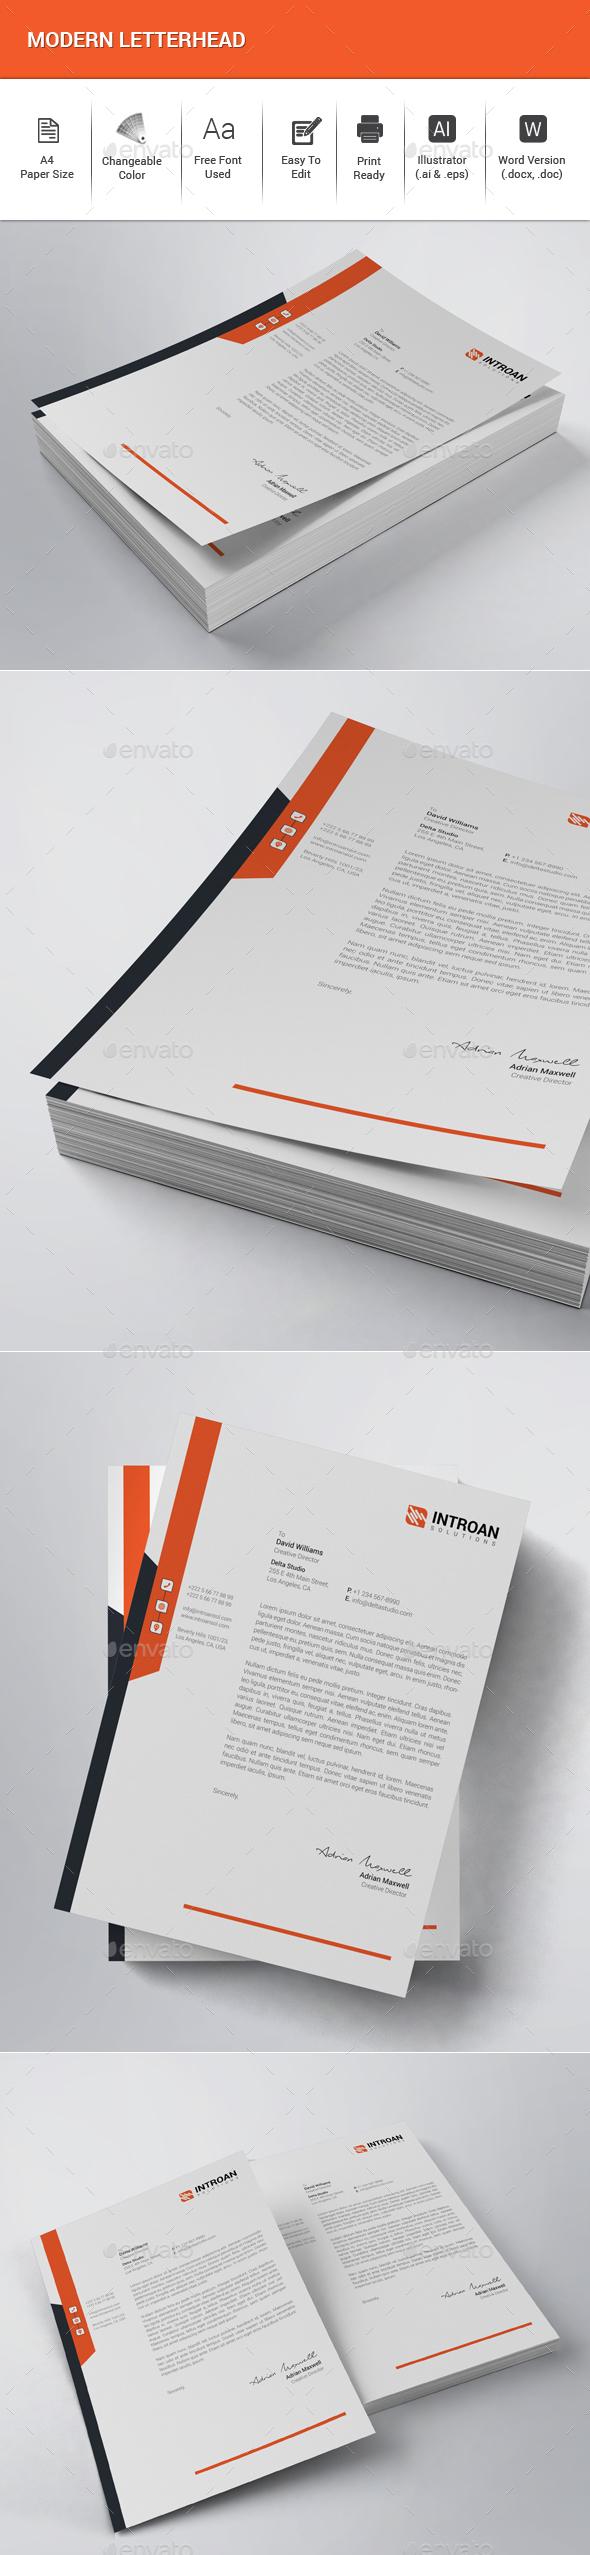 Modern Letterhead - Stationery Print Templates